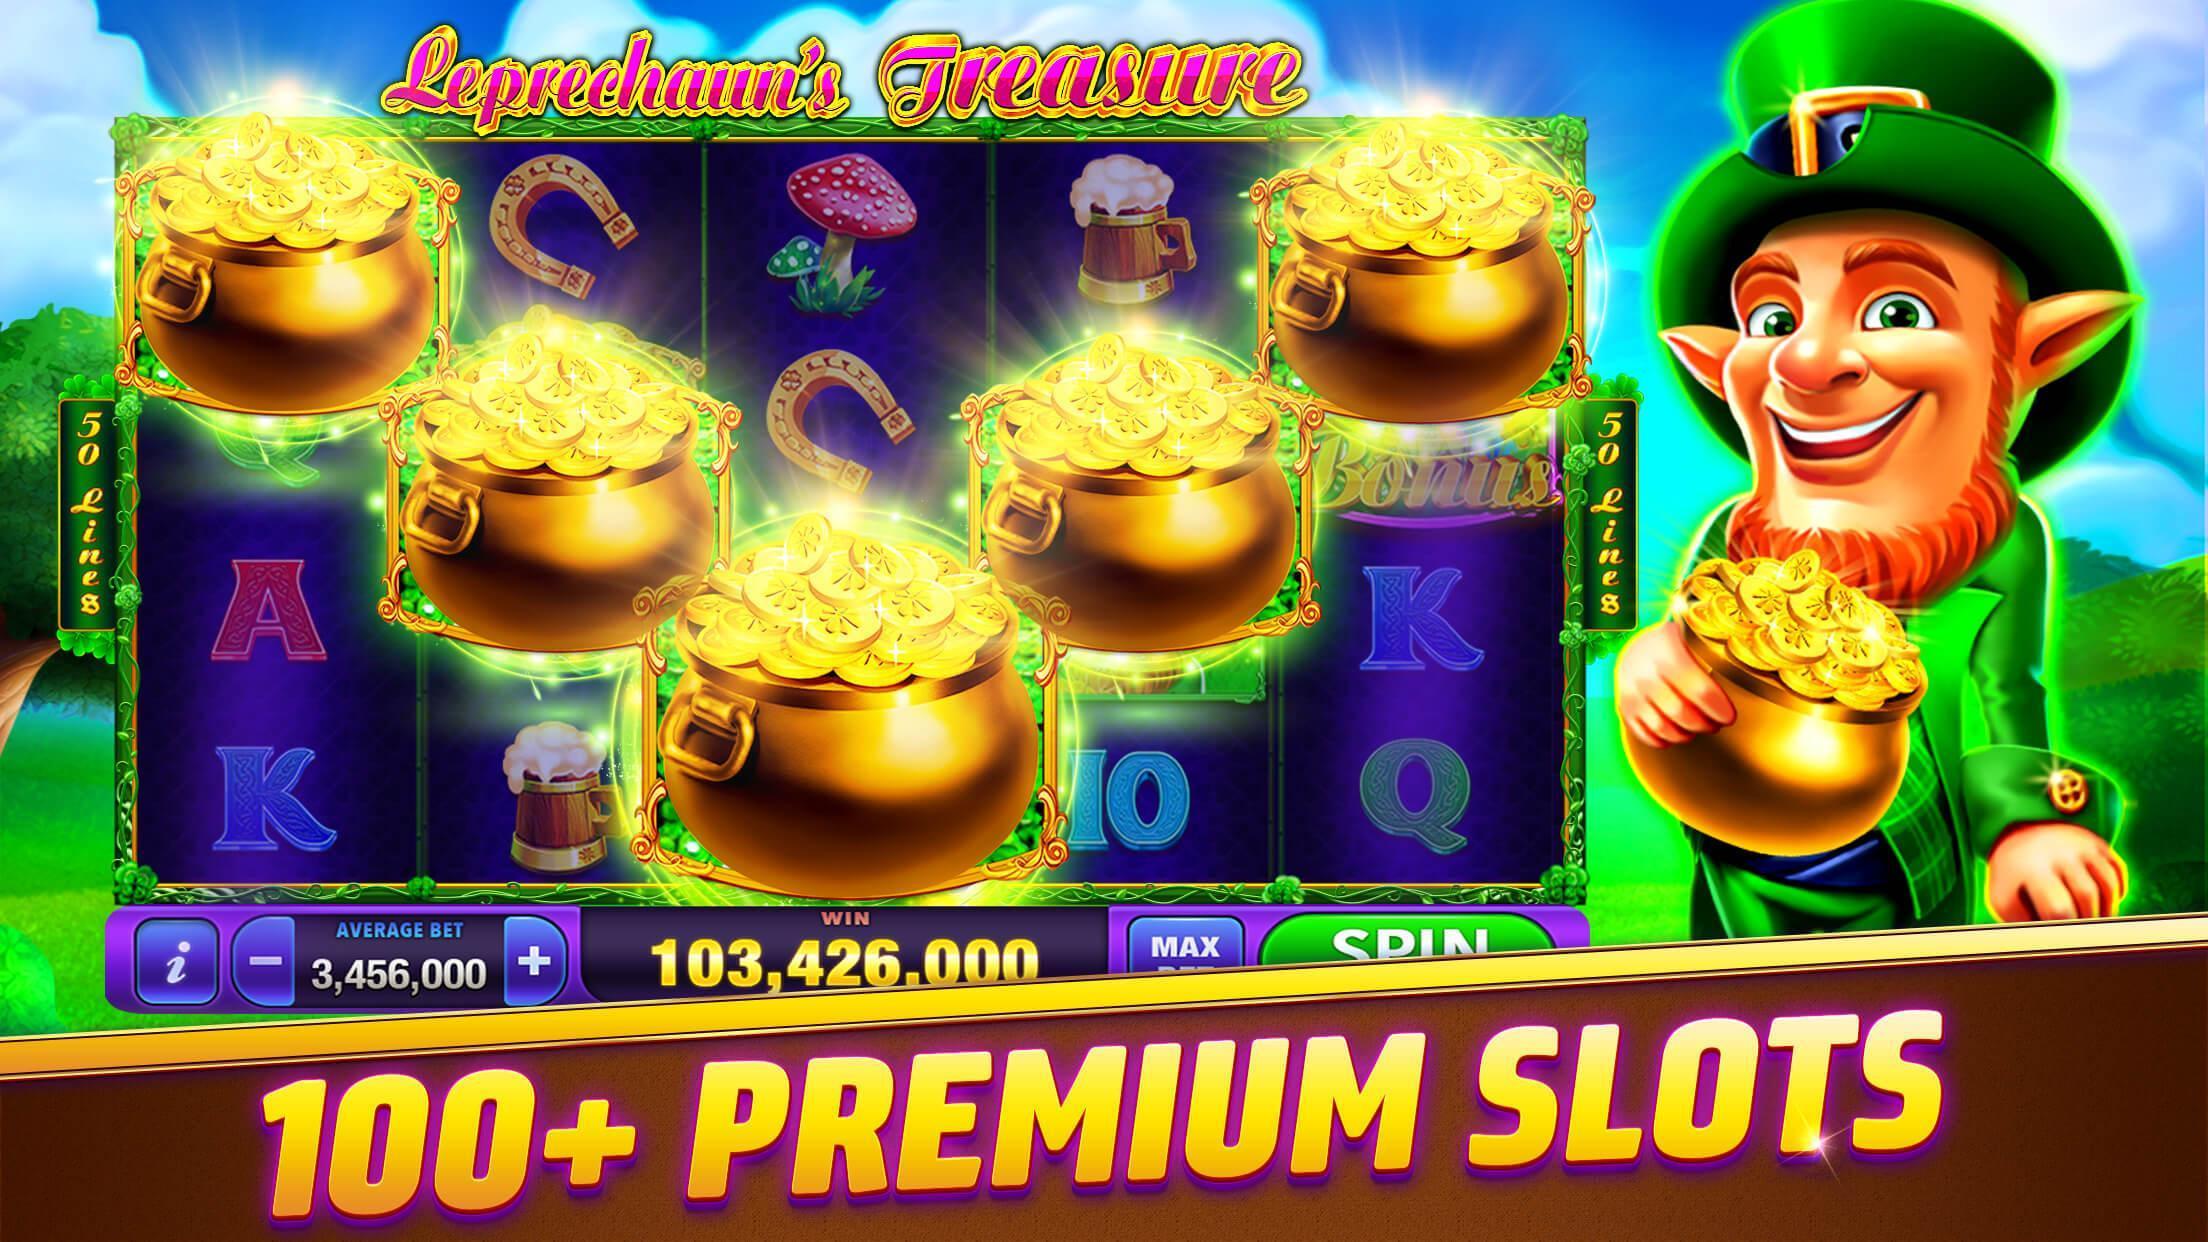 Casino Online Apk Downloader Download Android - Everro Slot